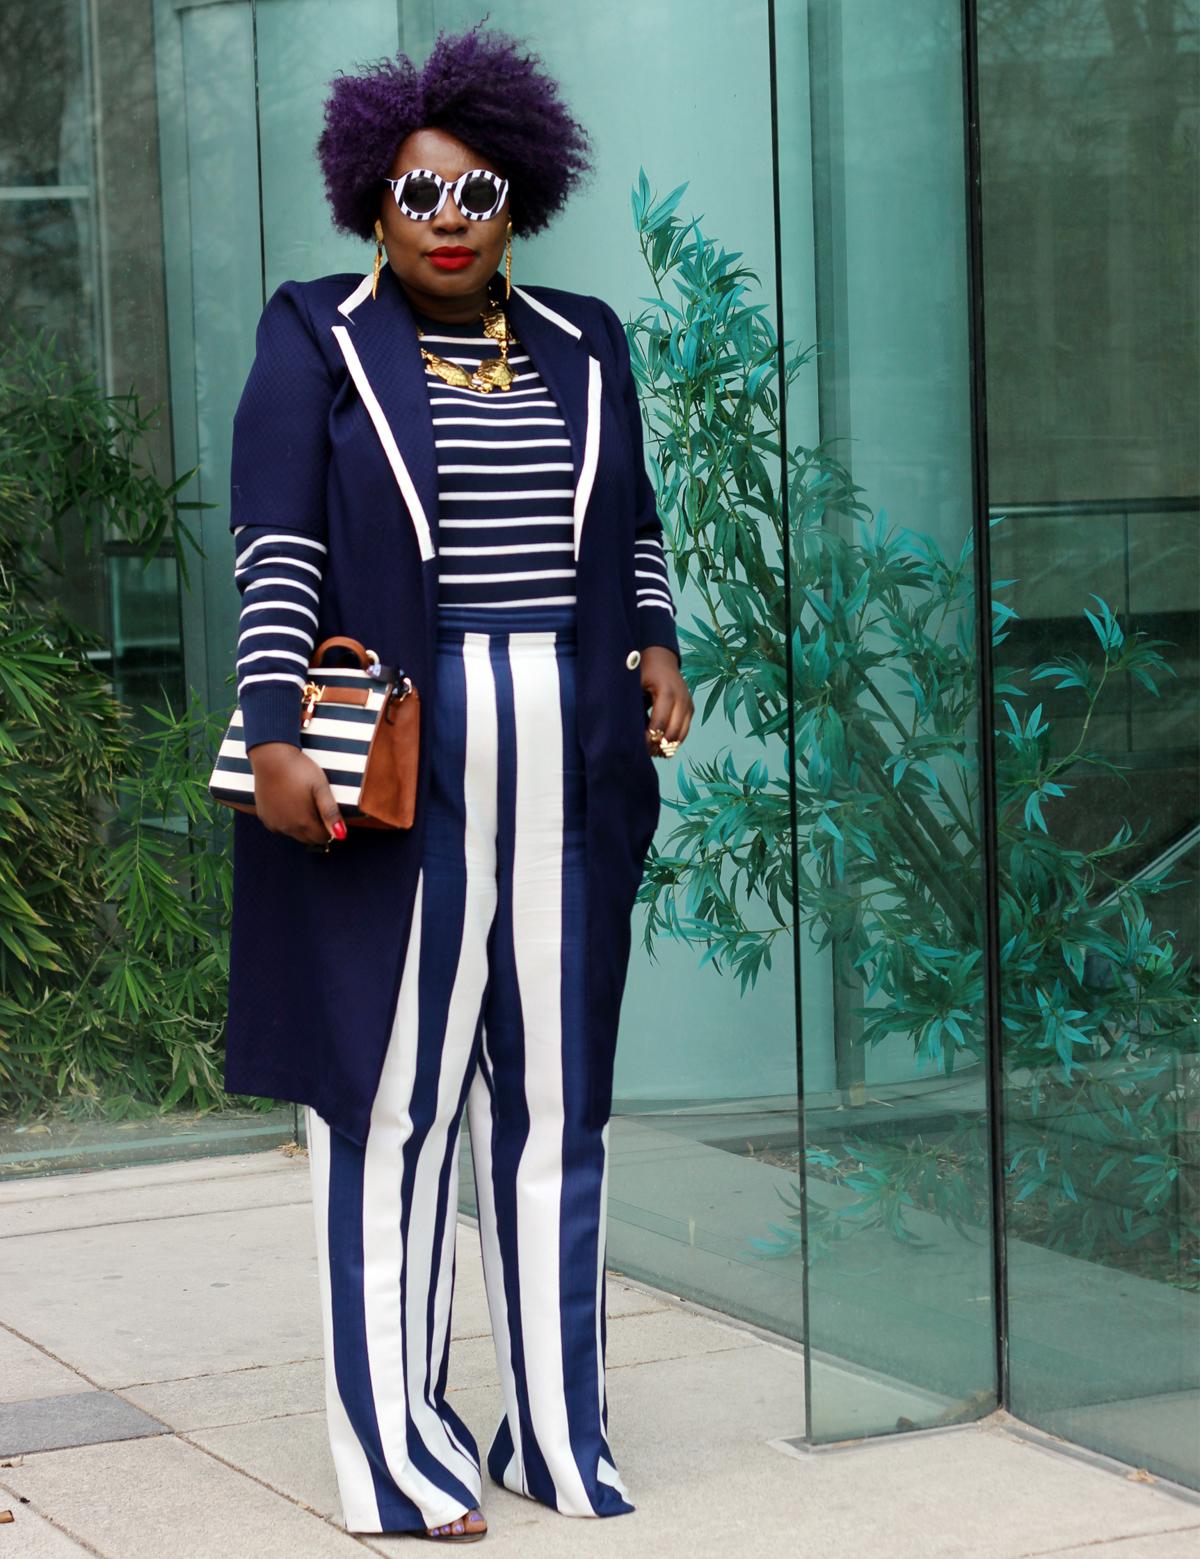 plus-size-style-fashion-week-outfit-stripes-plus-size-stripes-plus-size-street-style-01.jpg